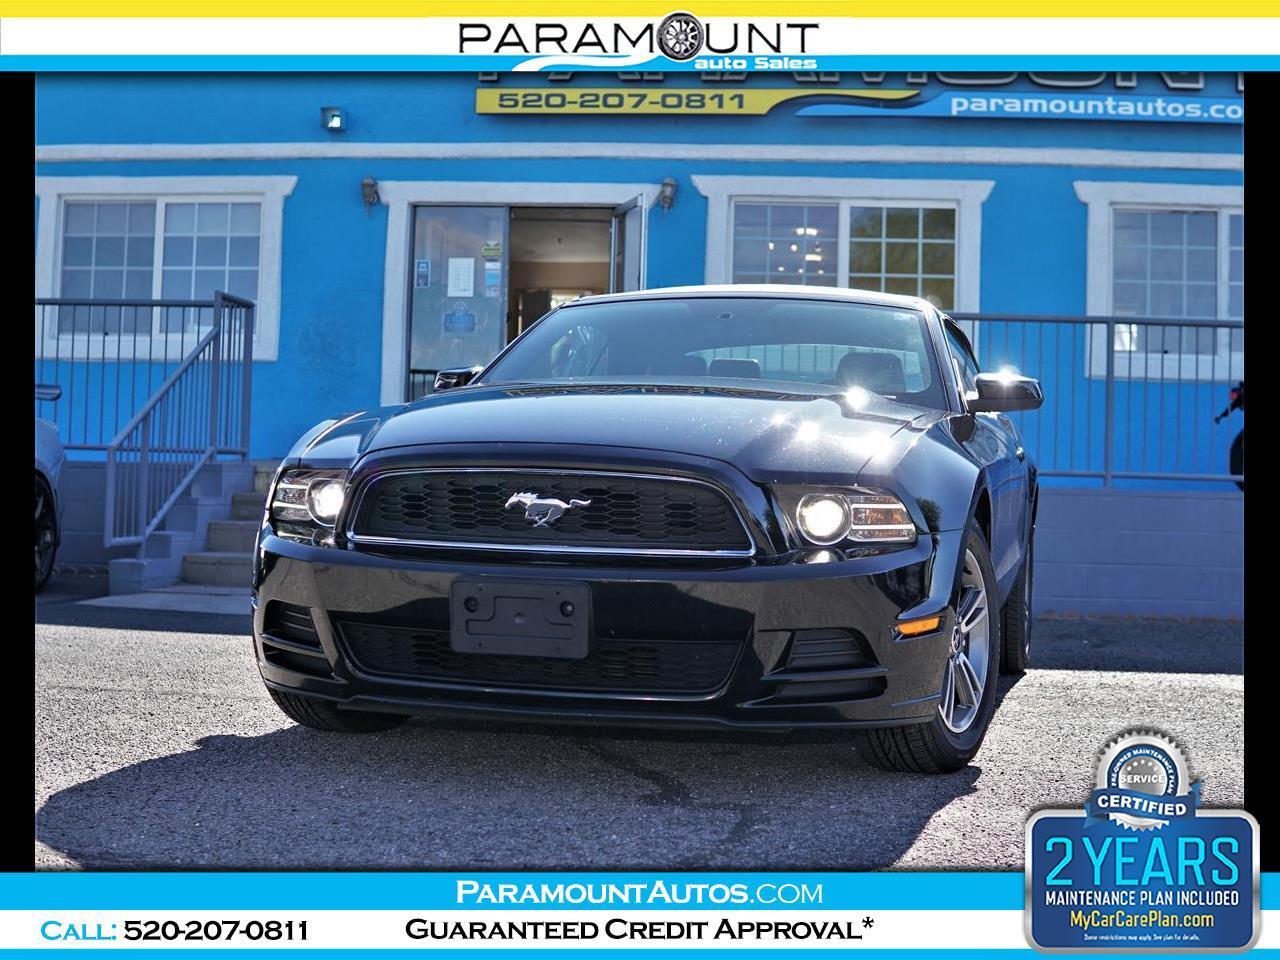 Ford Mustang 2dr Conv V6 Premium 2013